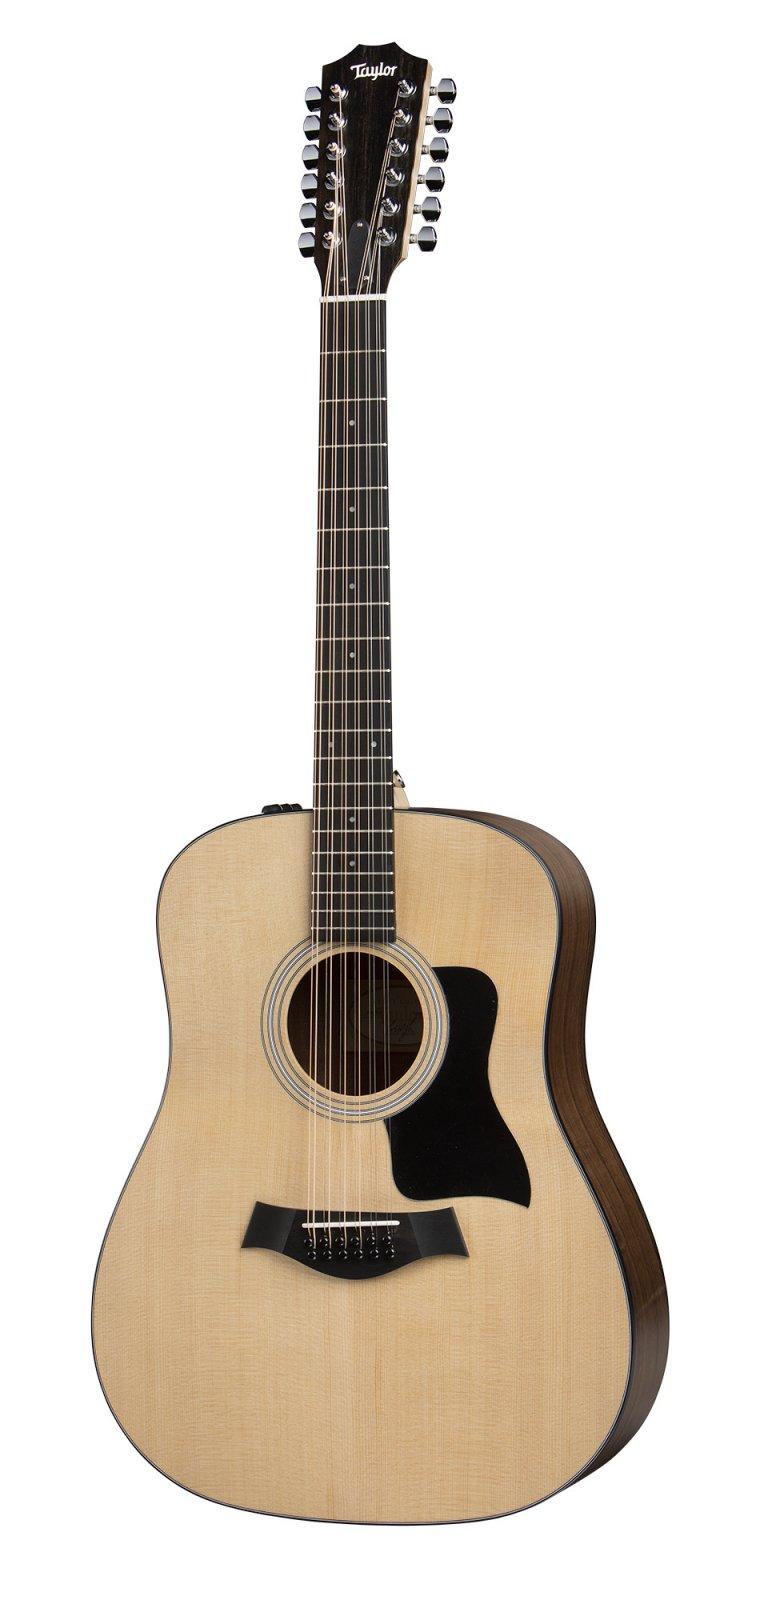 Taylor 150e